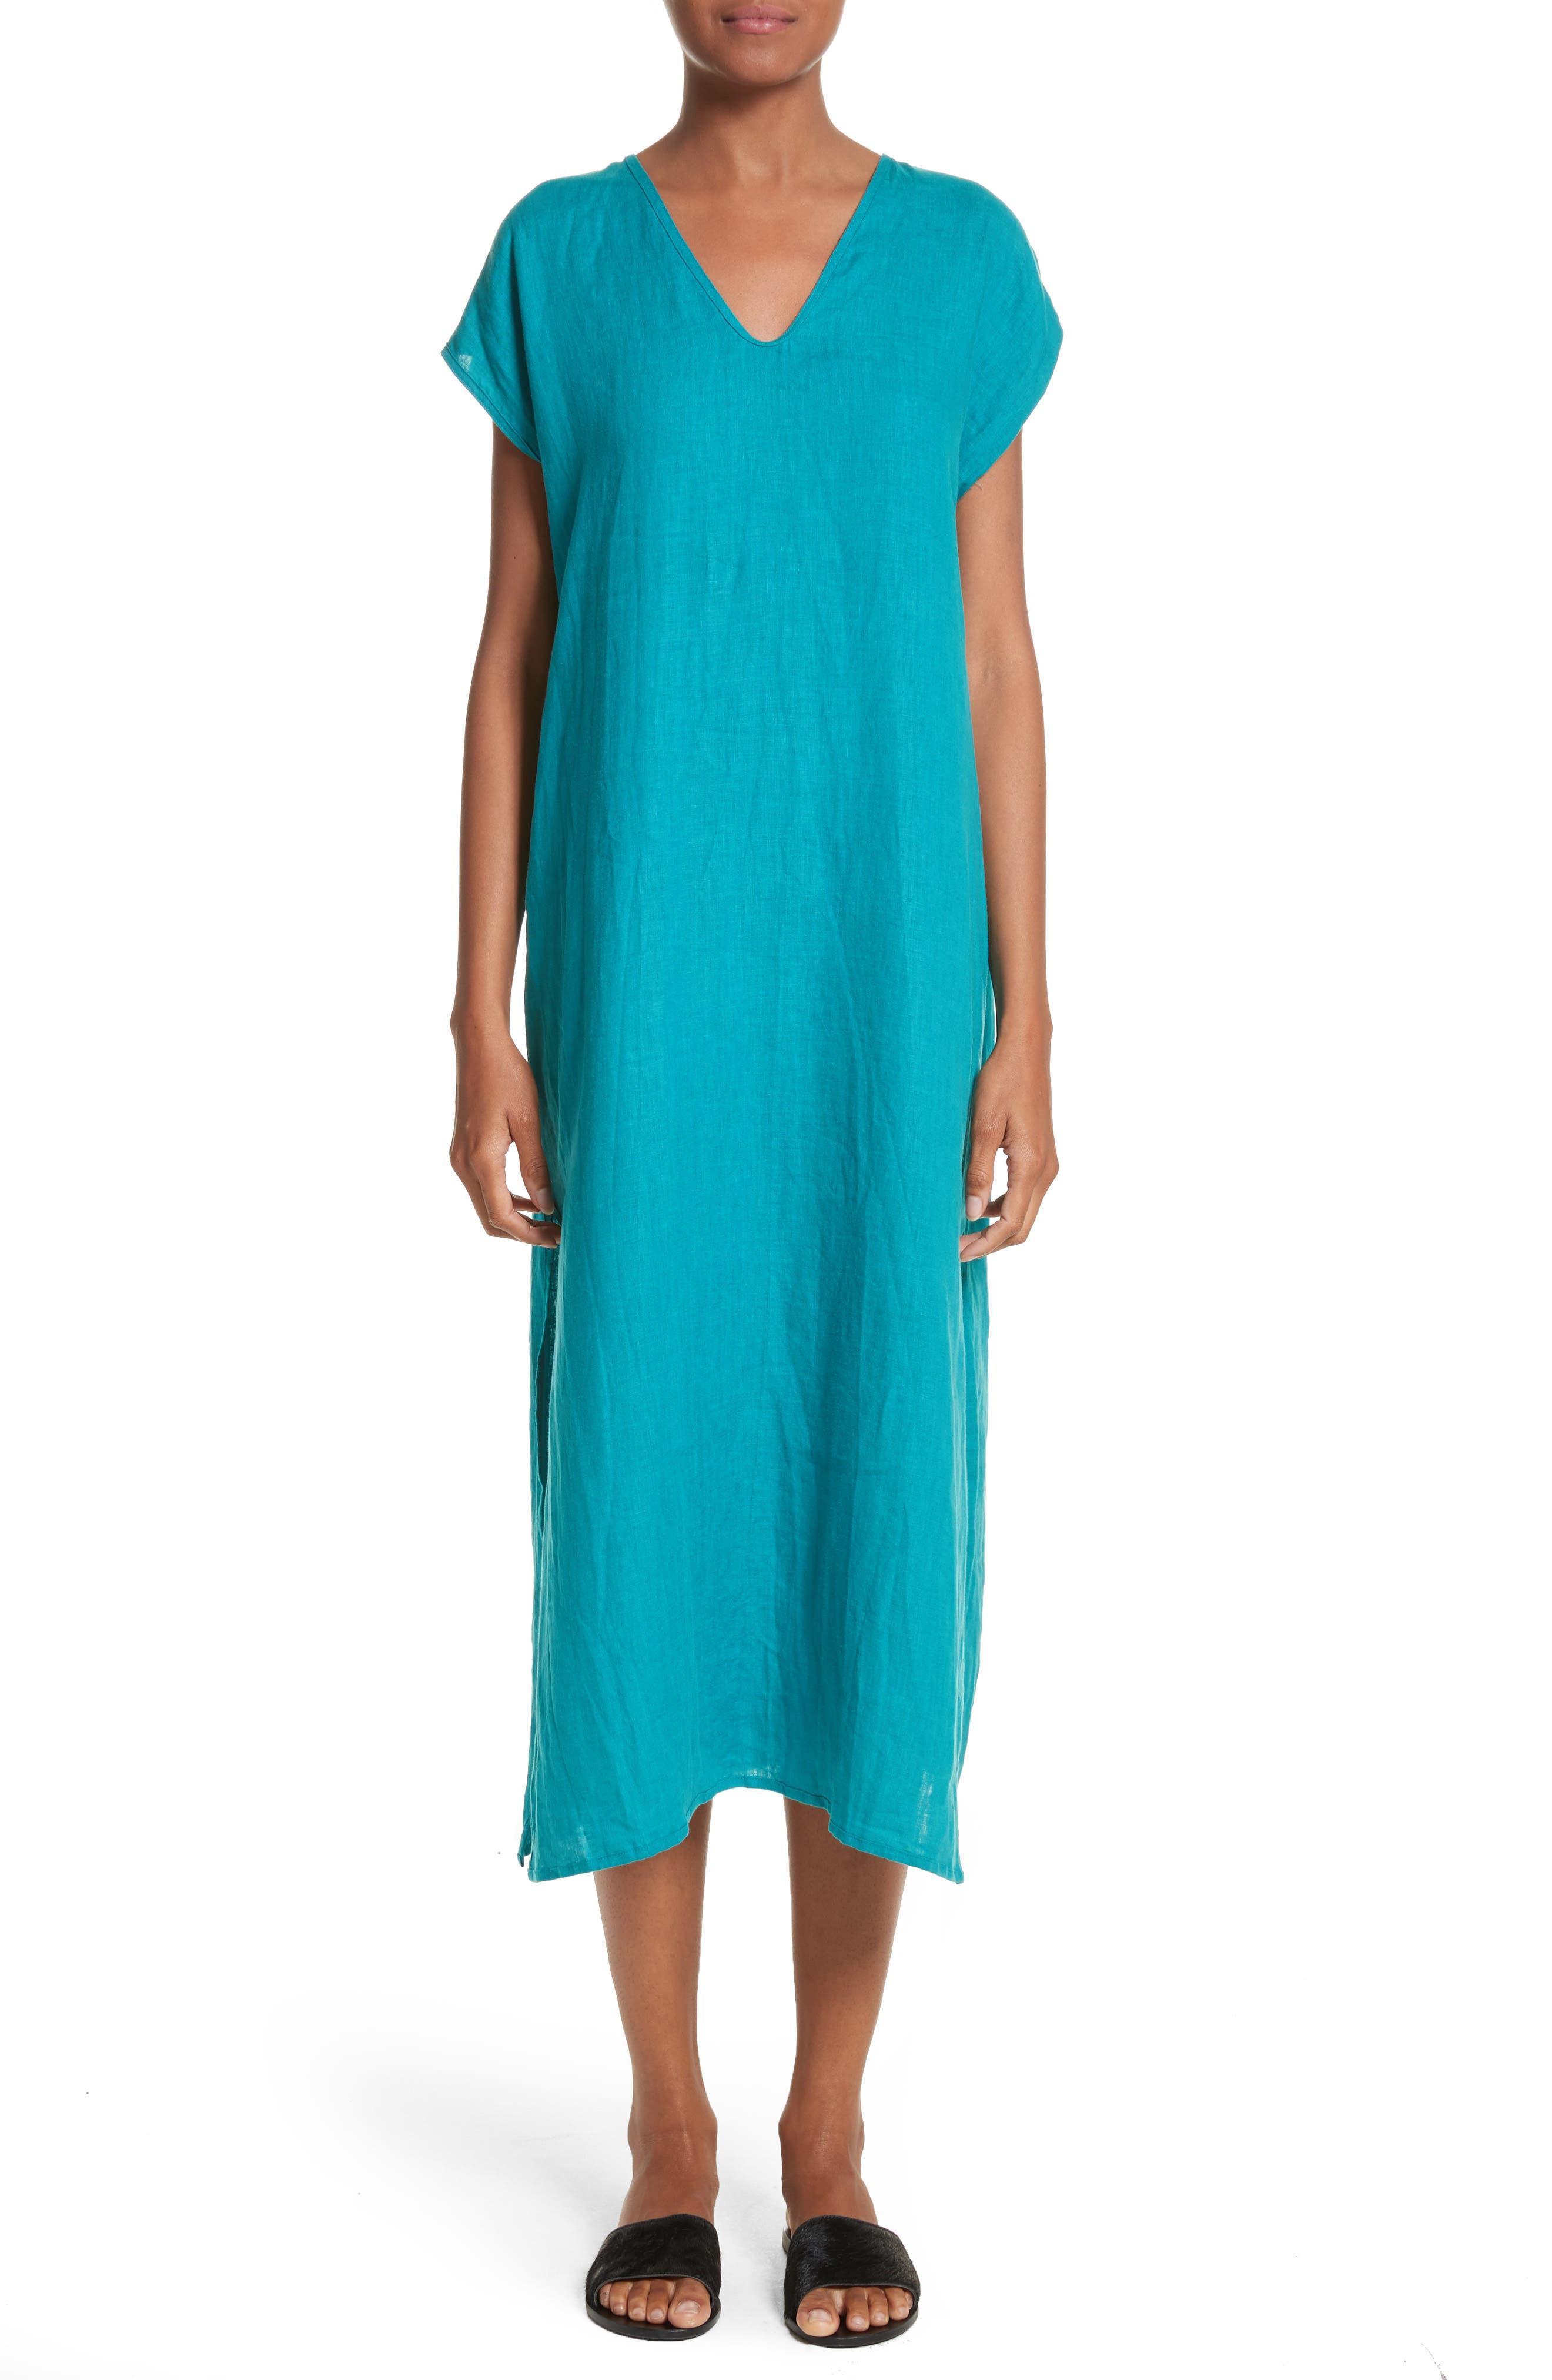 Simon Miller Cecil Cap Sleeve Tunic Dress